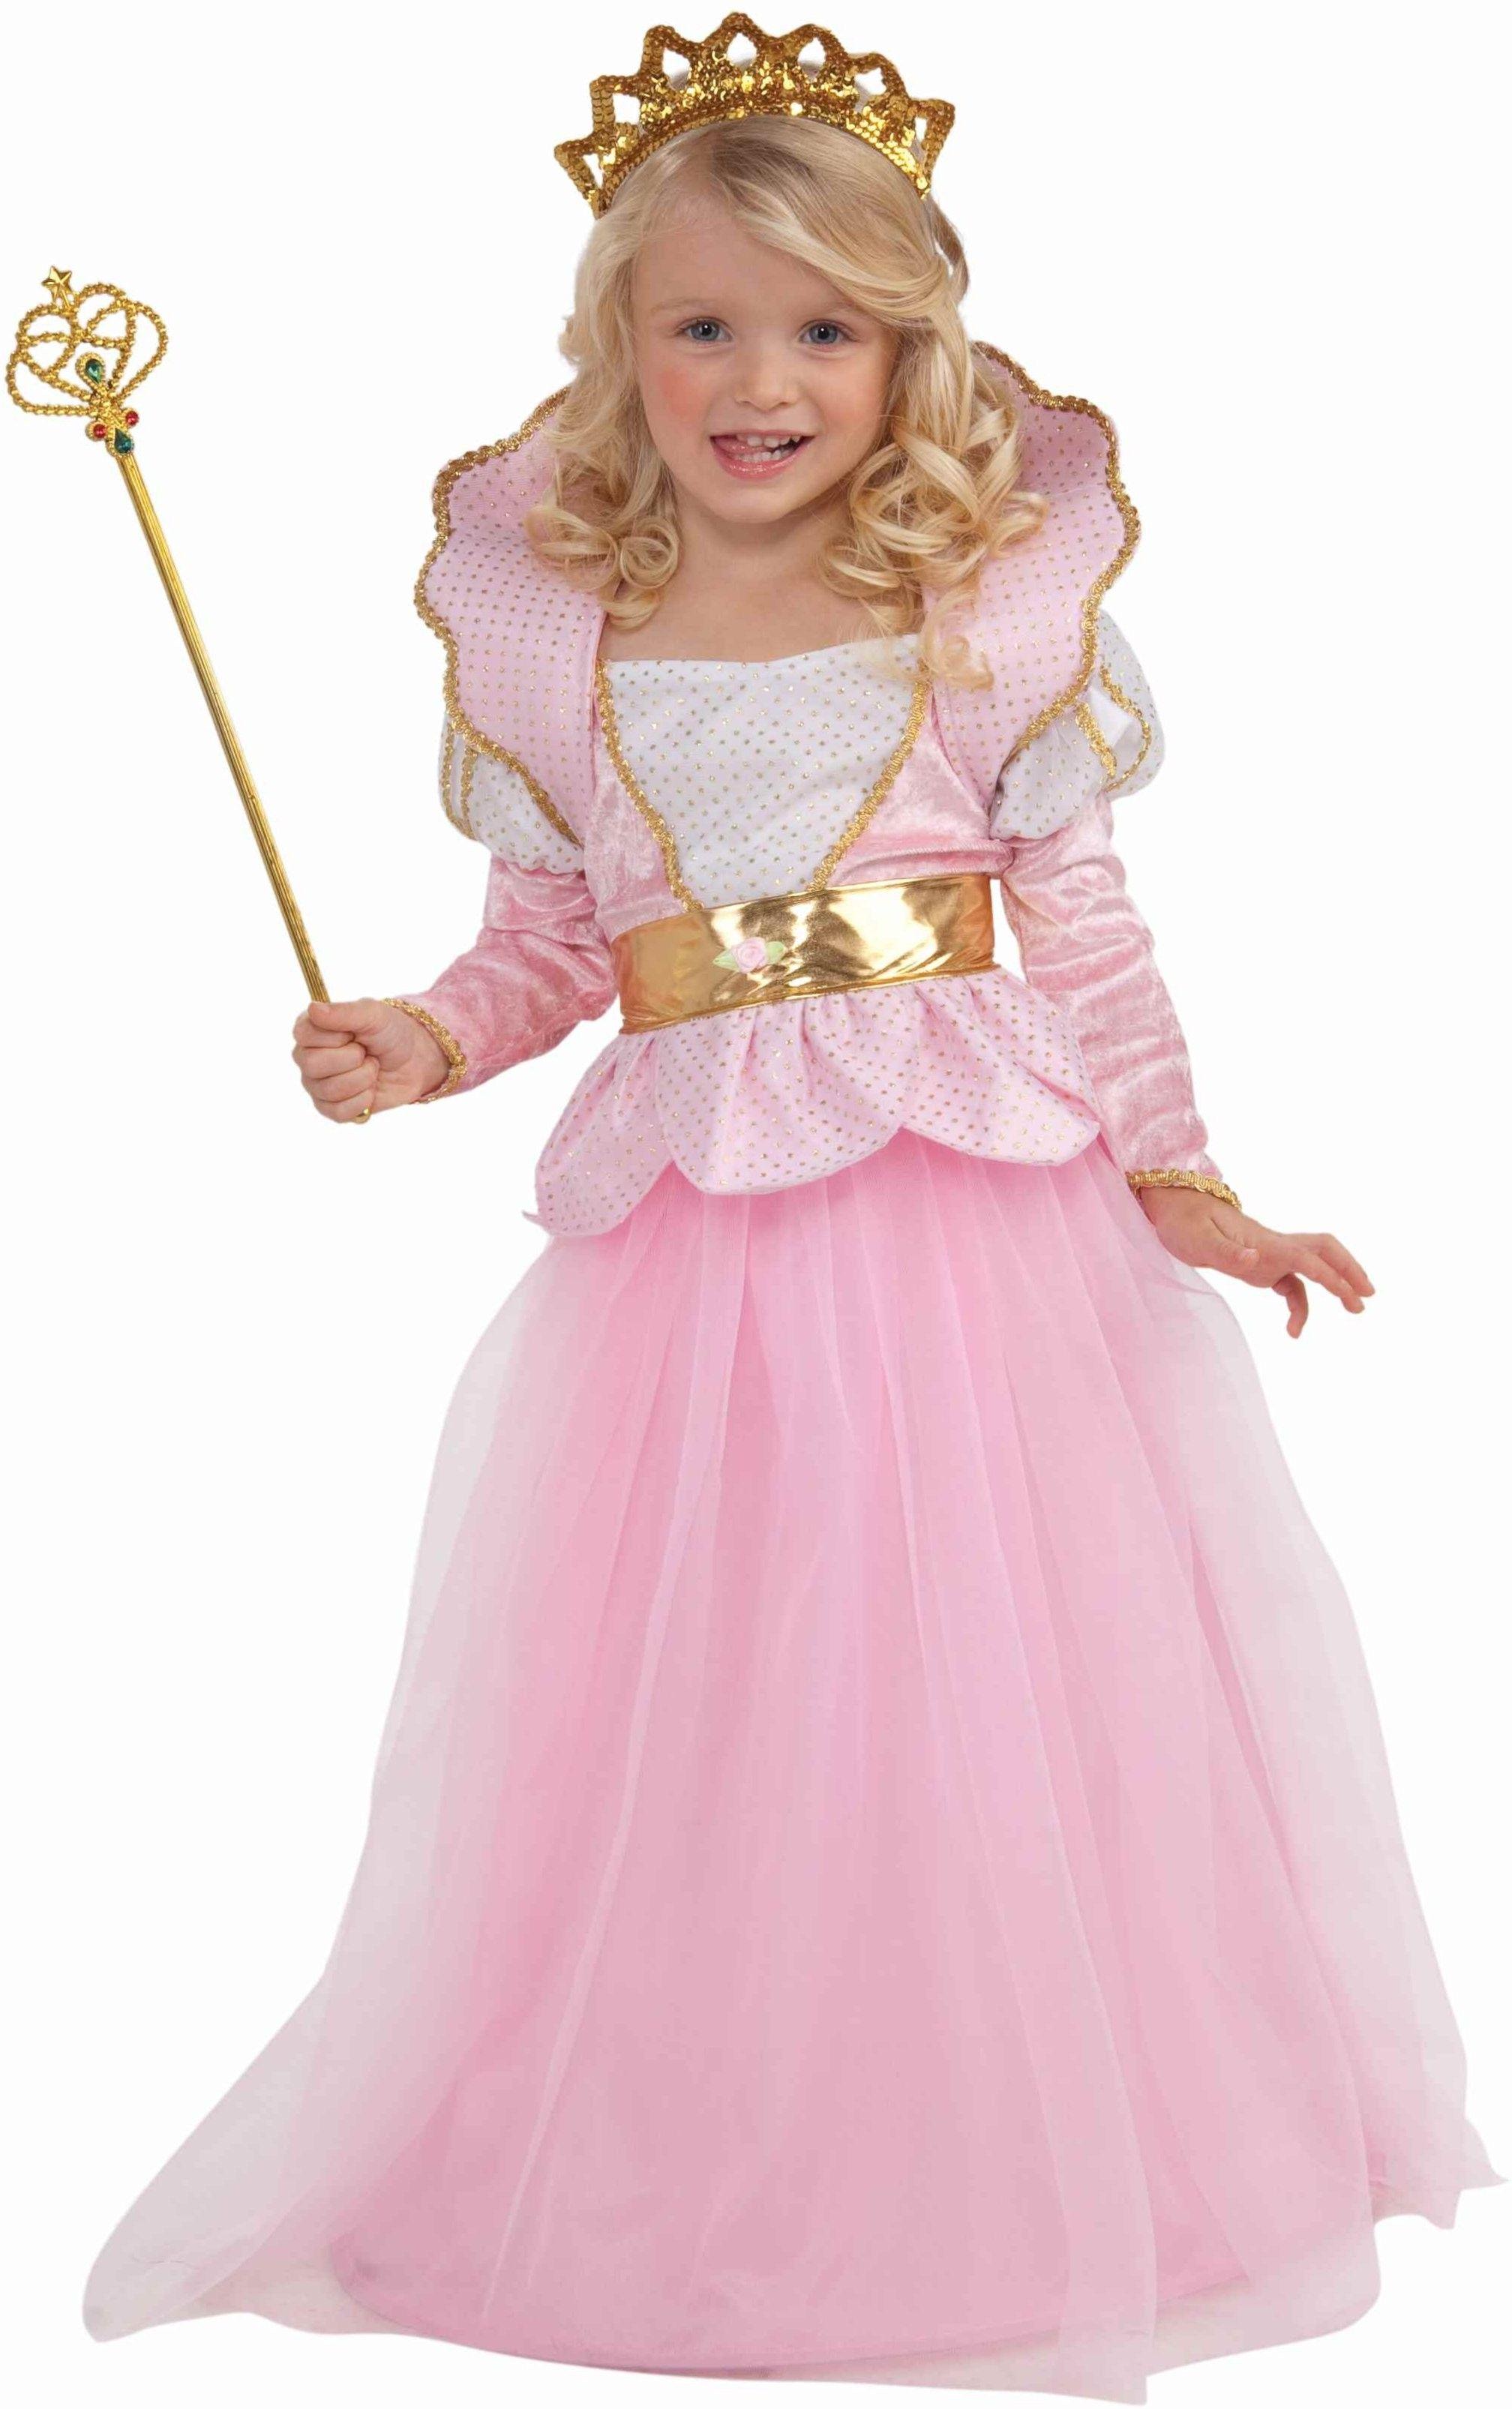 c86021803 this pink princess costume dress is super cute!  Princess ...